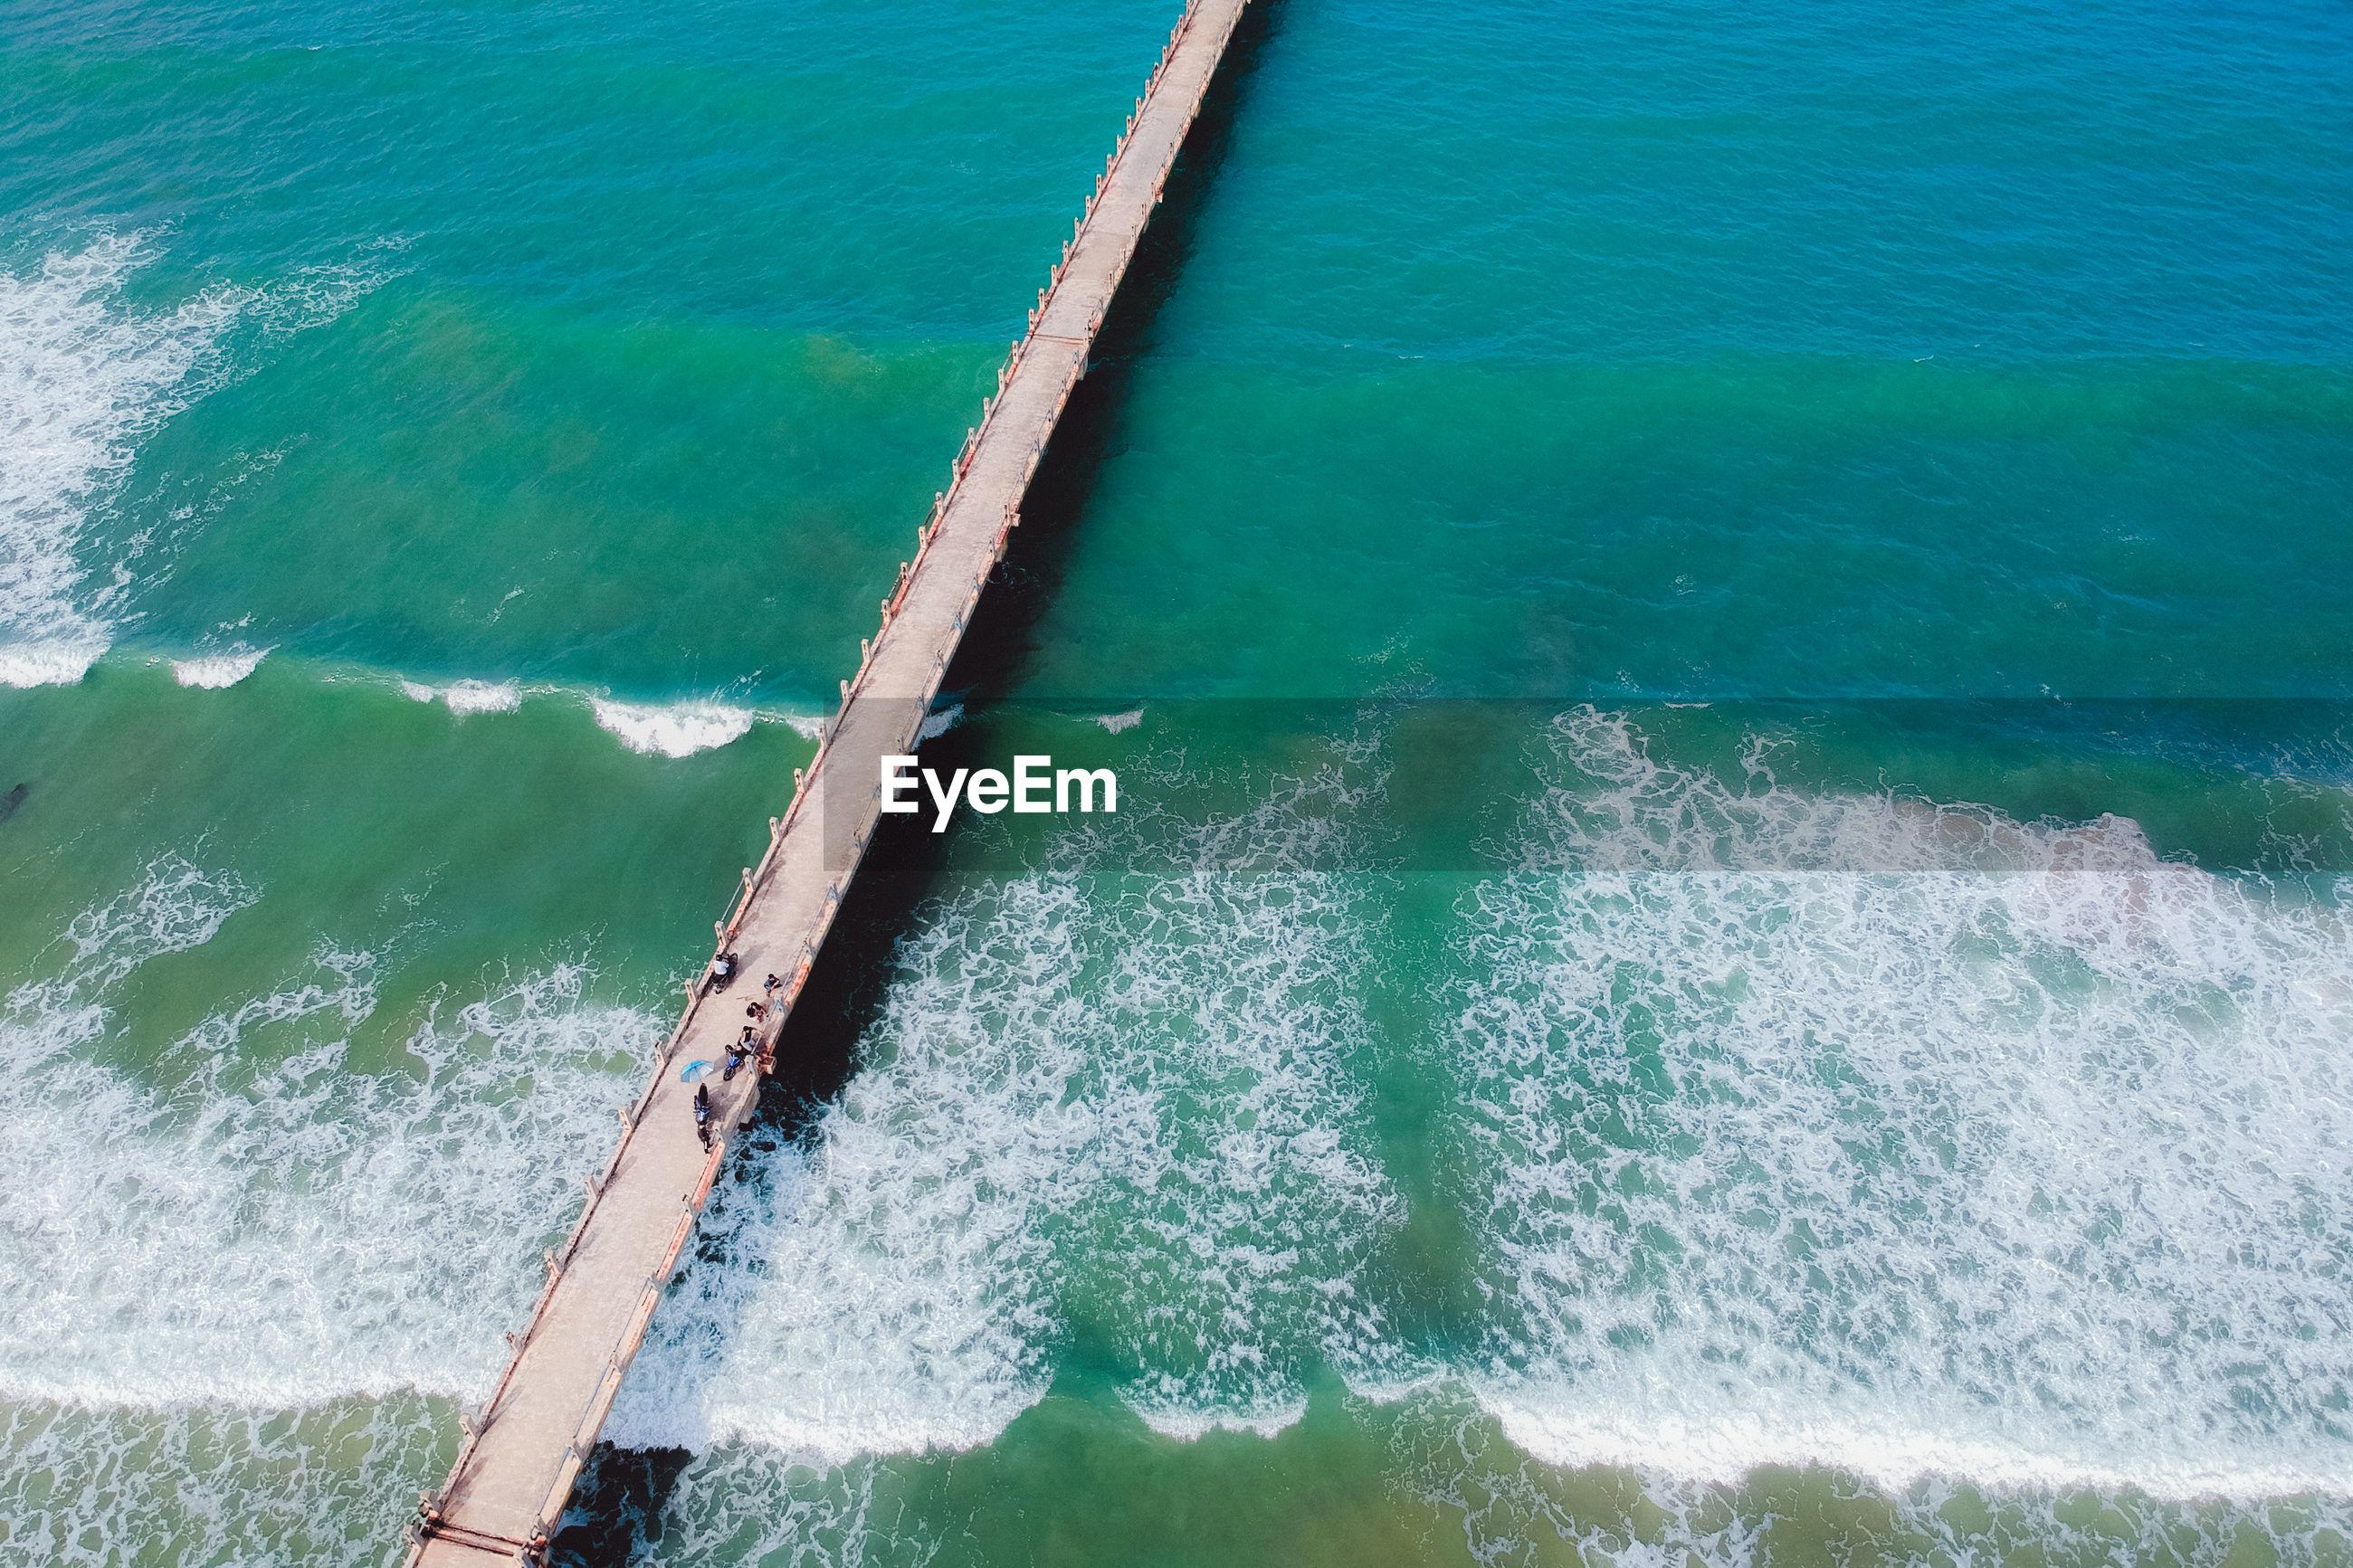 HIGH ANGLE VIEW OF WAVES SPLASHING ON SEA SHORE